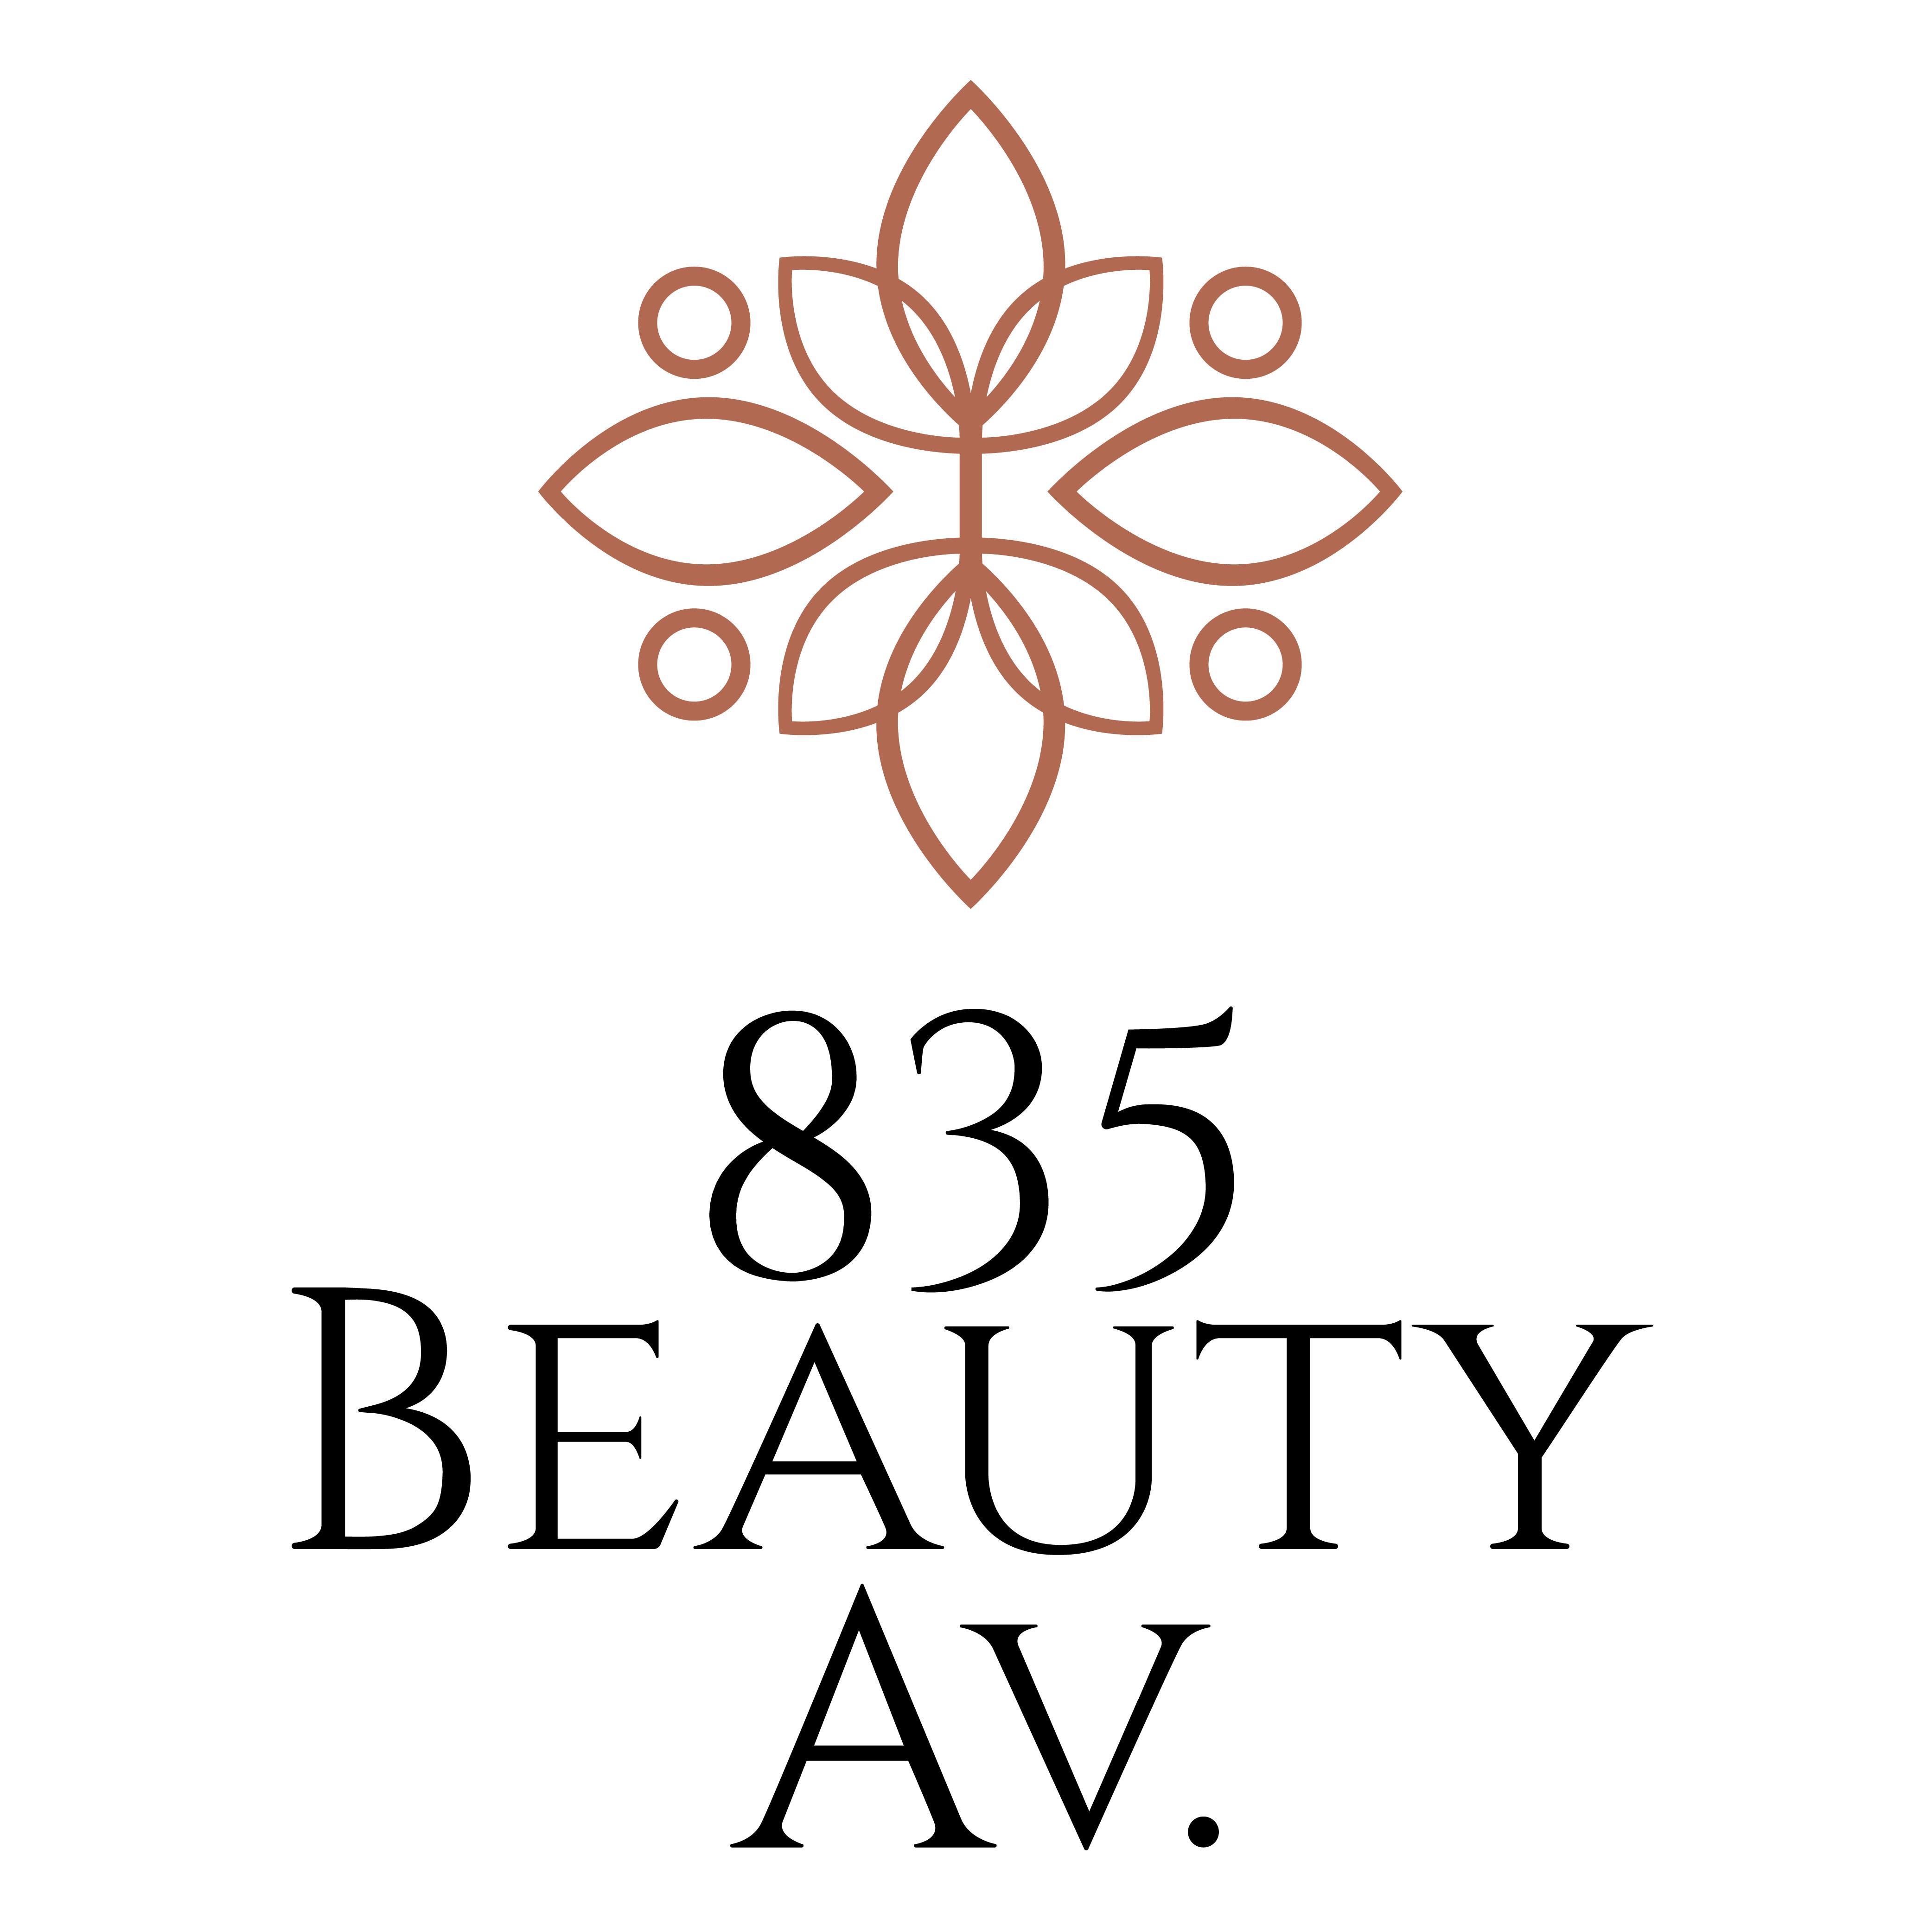 835 BEAUTY AV